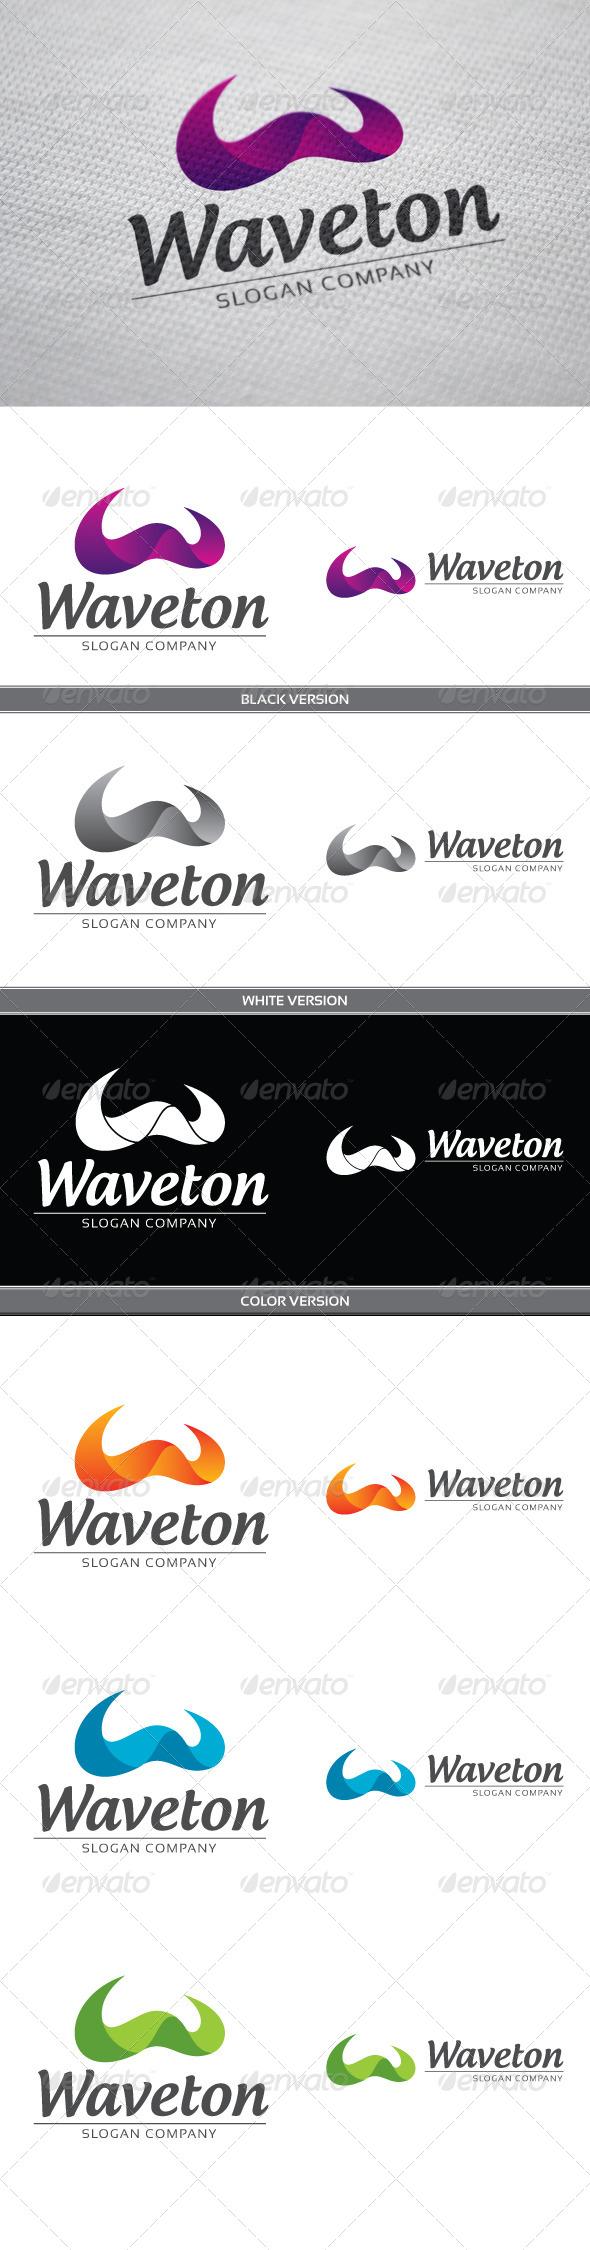 Waveton - Letters Logo Templates